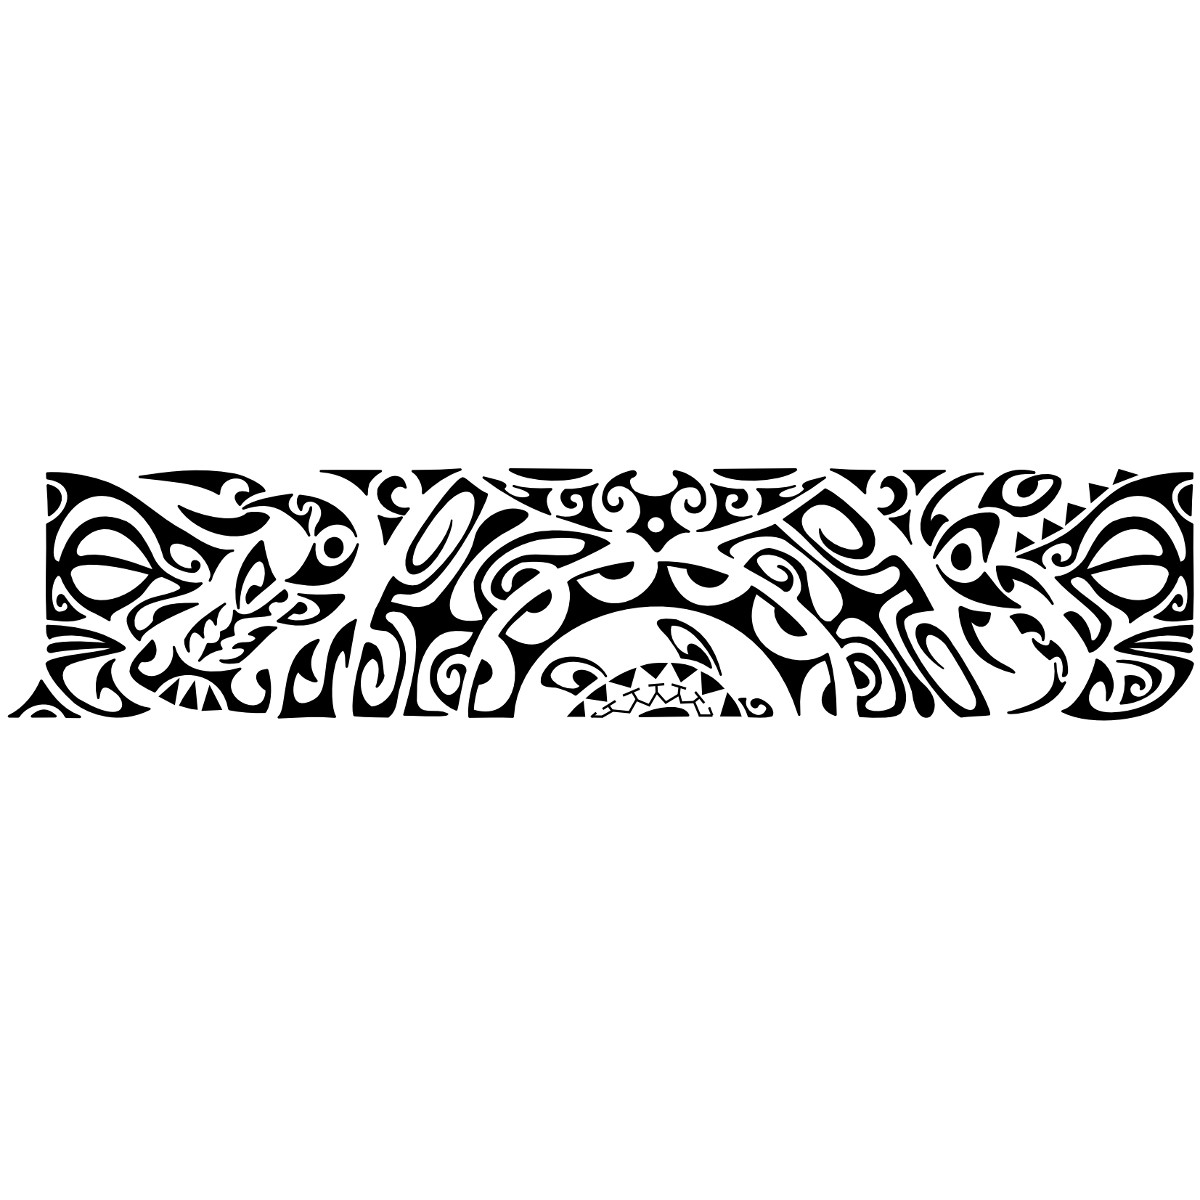 Maori Bracelet Tattoo: 8 Awesome Armband Tattoo Designs